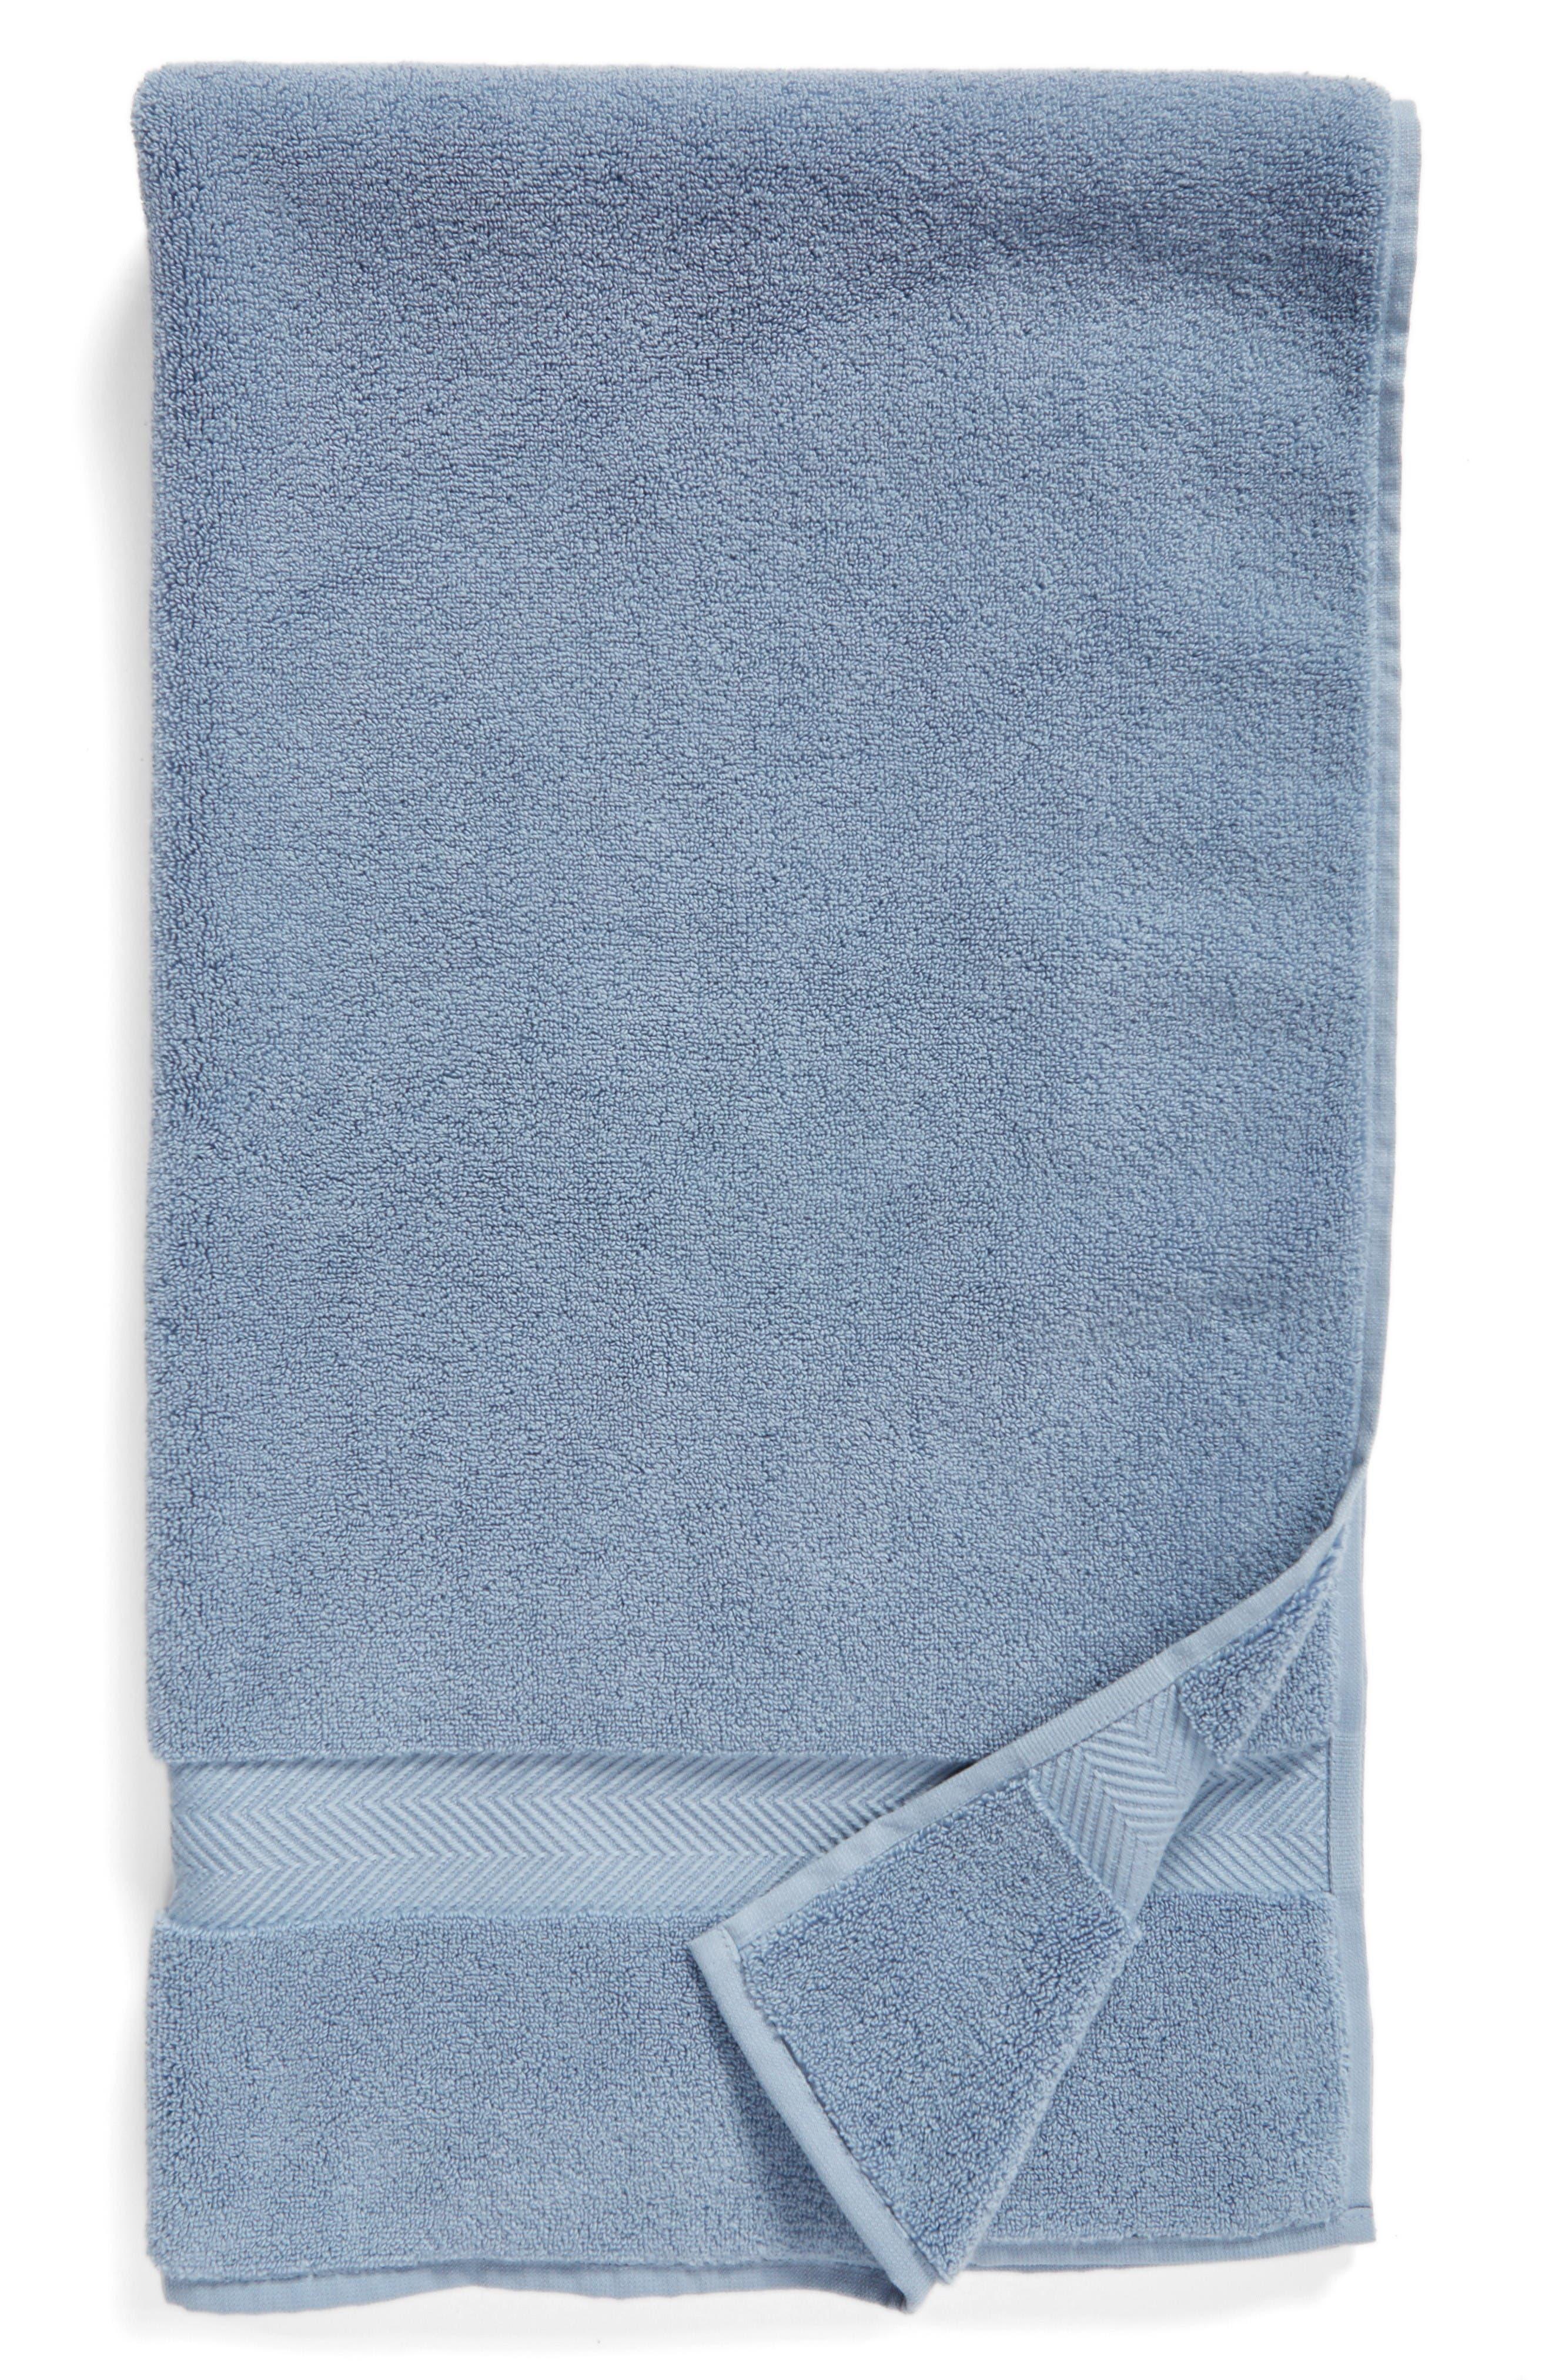 Nordstrom at Home Hydrocotton Bath Towel